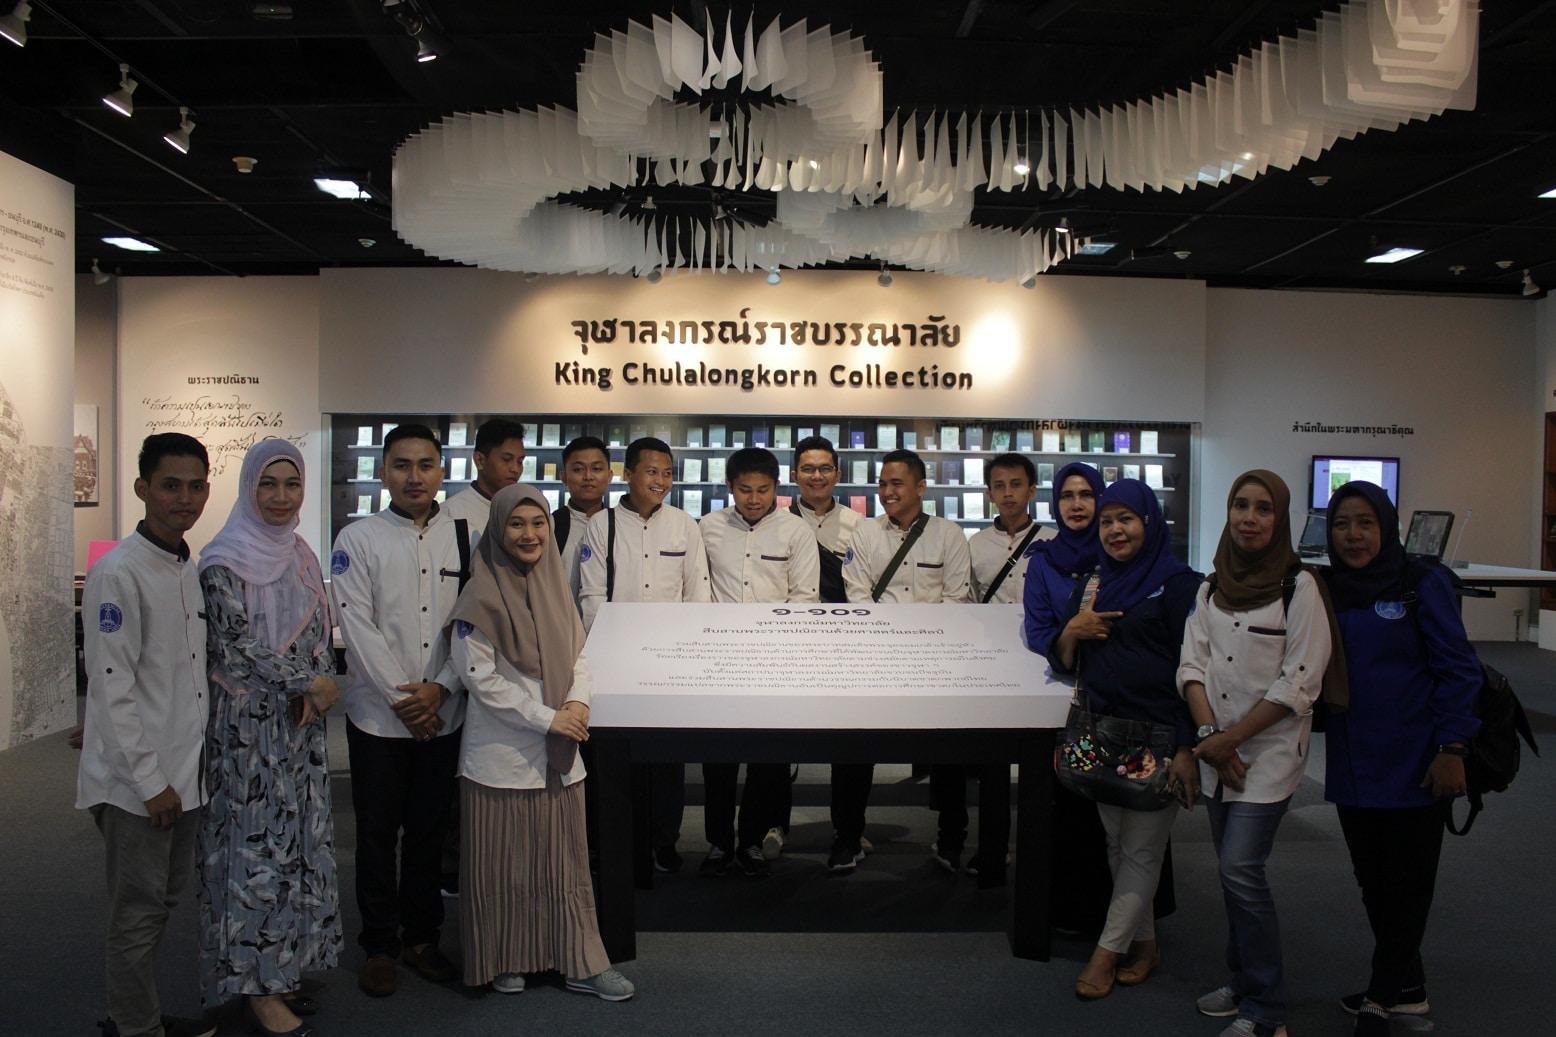 Foto di Ruang Koleksi King Chulalongkorn